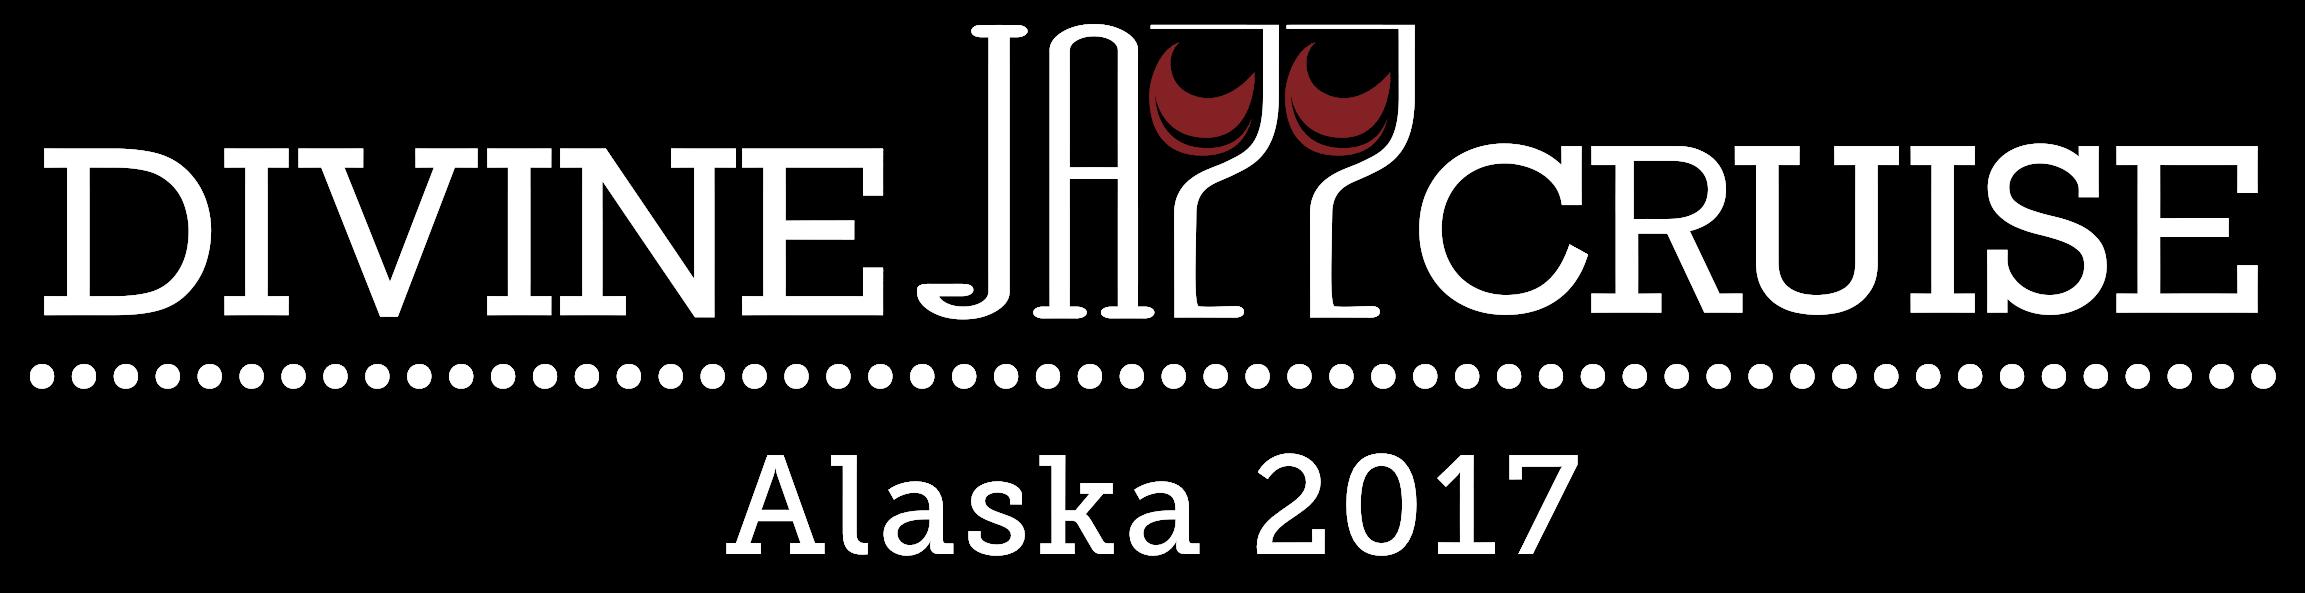 Divine Jazz Cruise - Alaska 2017